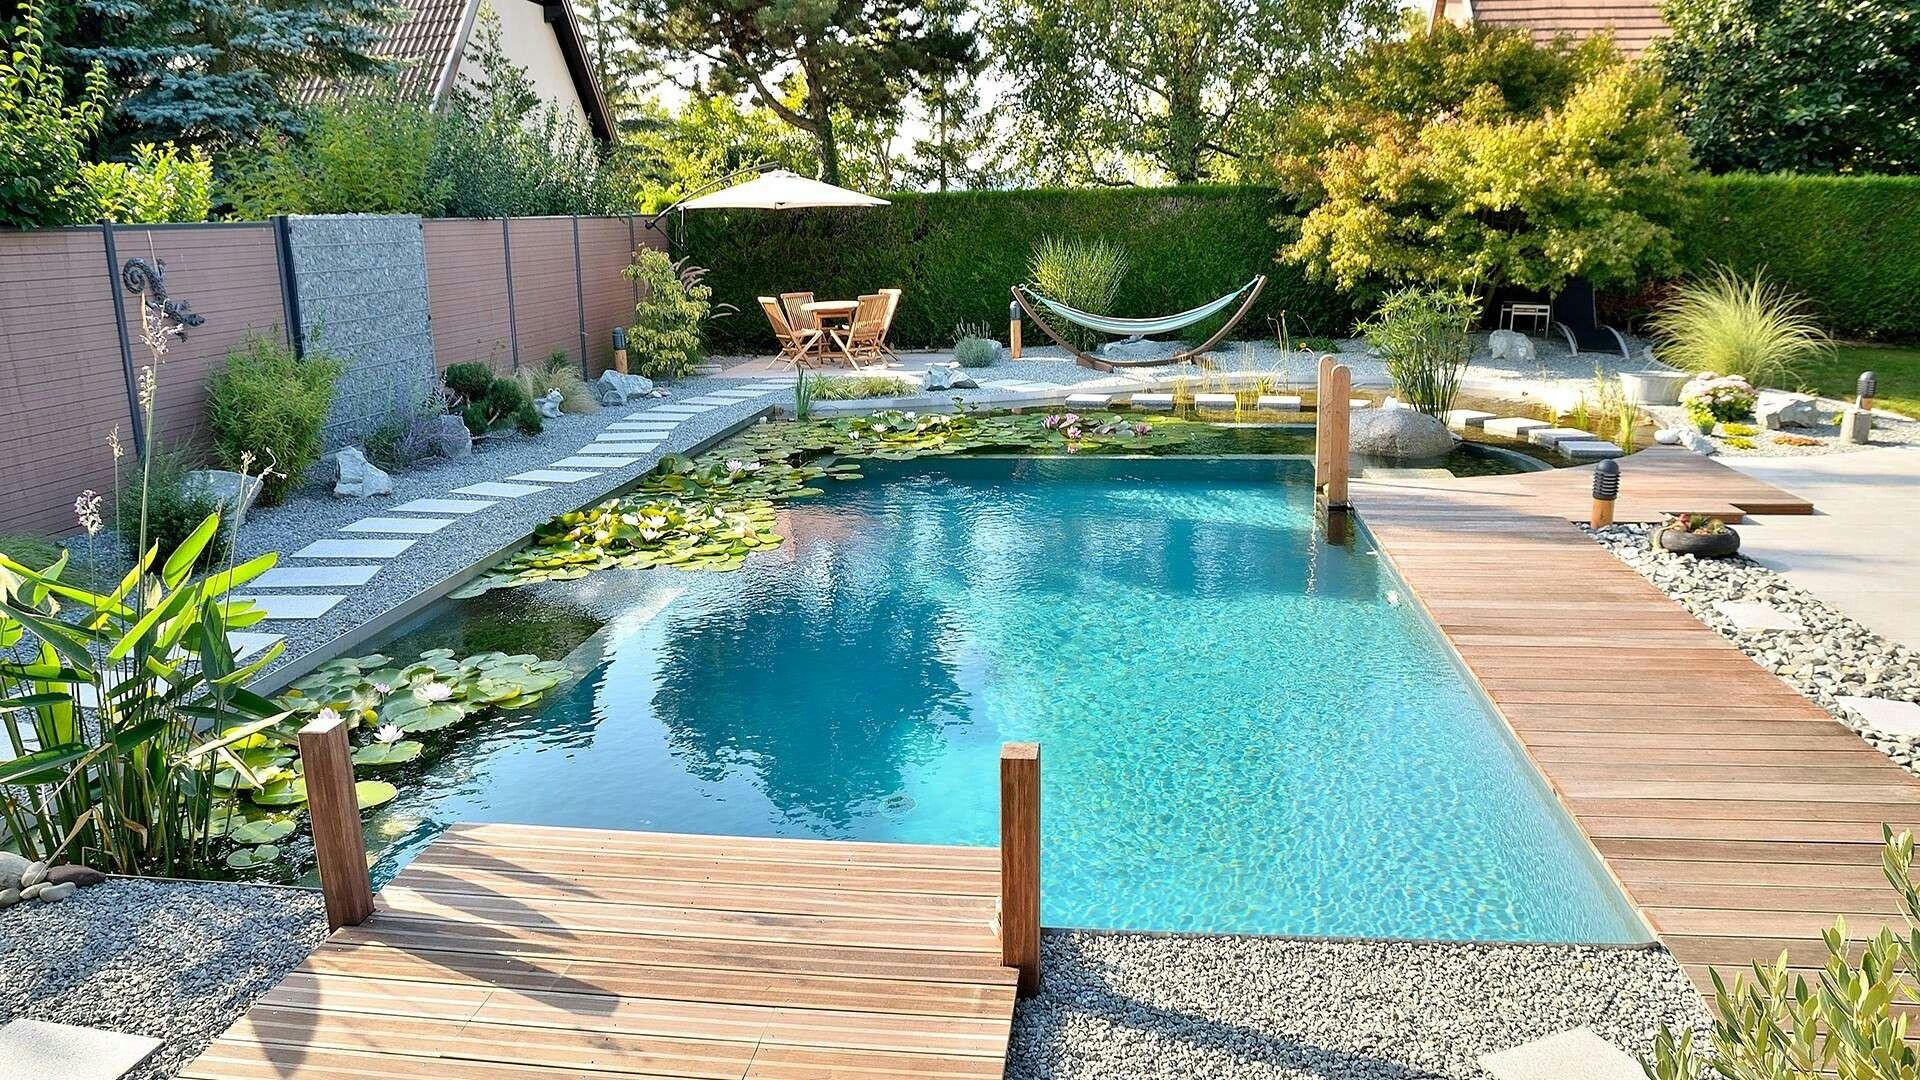 Pin By Kerry Matthews On Dream Pools Pinterest Dream Pools Diy